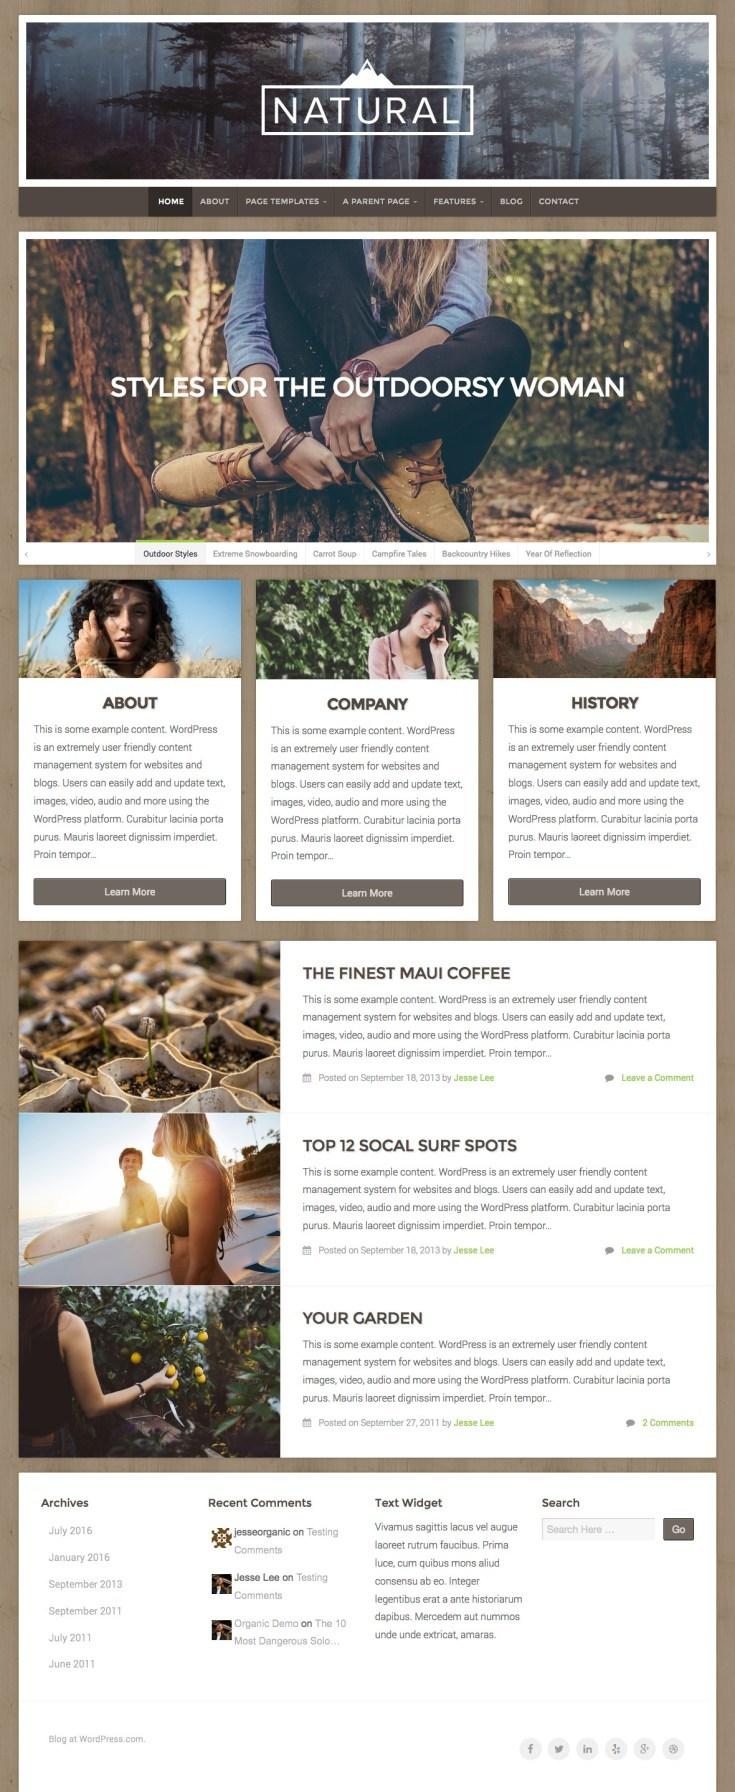 WordPress.com Natural theme